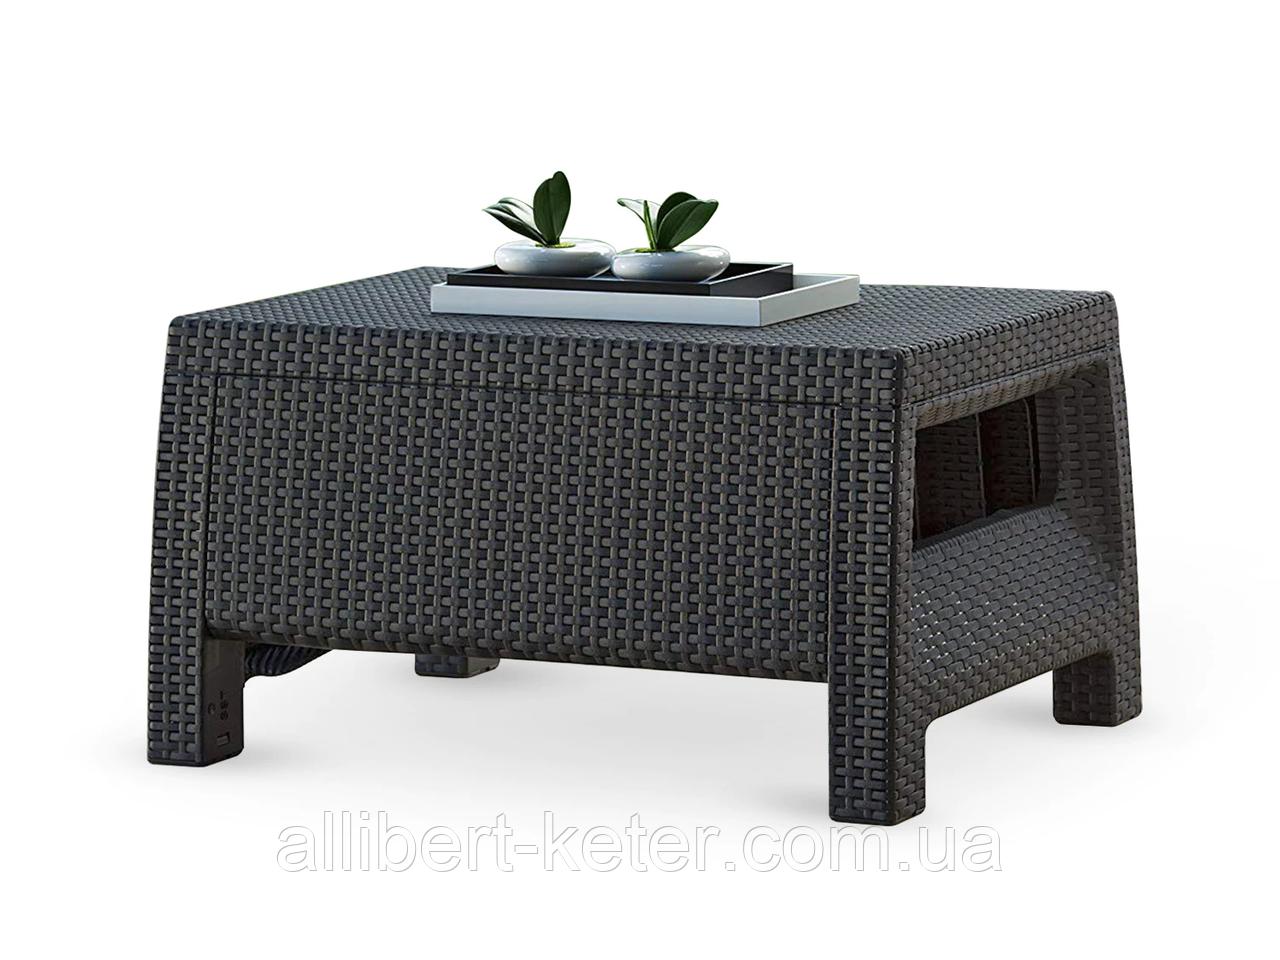 Стол садовый Allibert by Keter Corfu Coffee Table